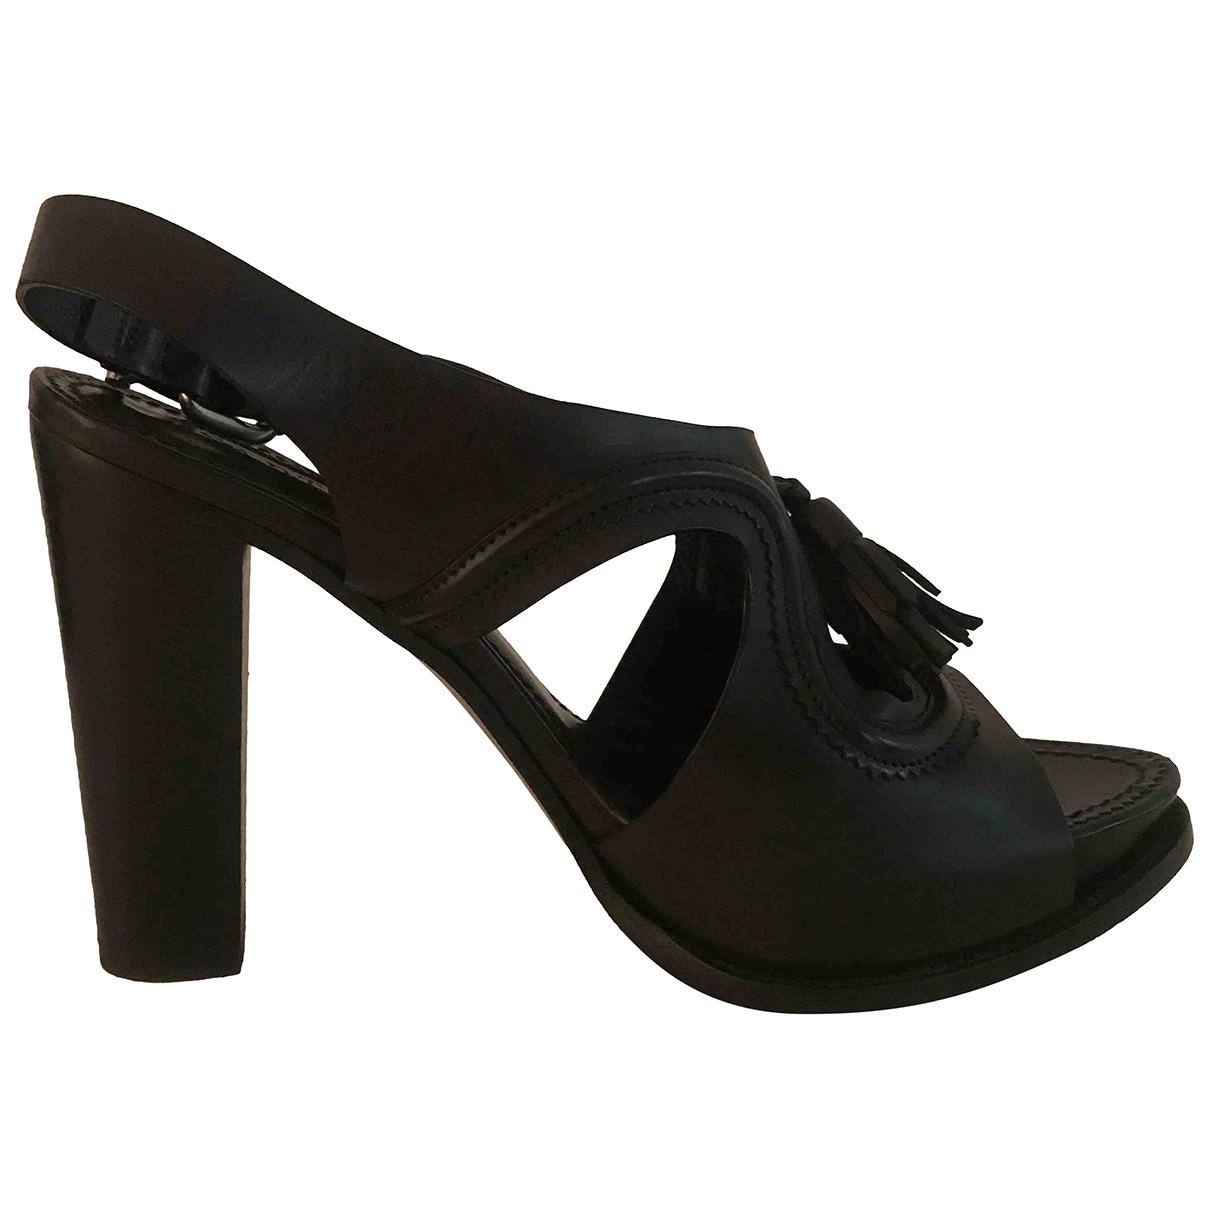 Sartore \N Black Leather Sandals for Women 37 EU